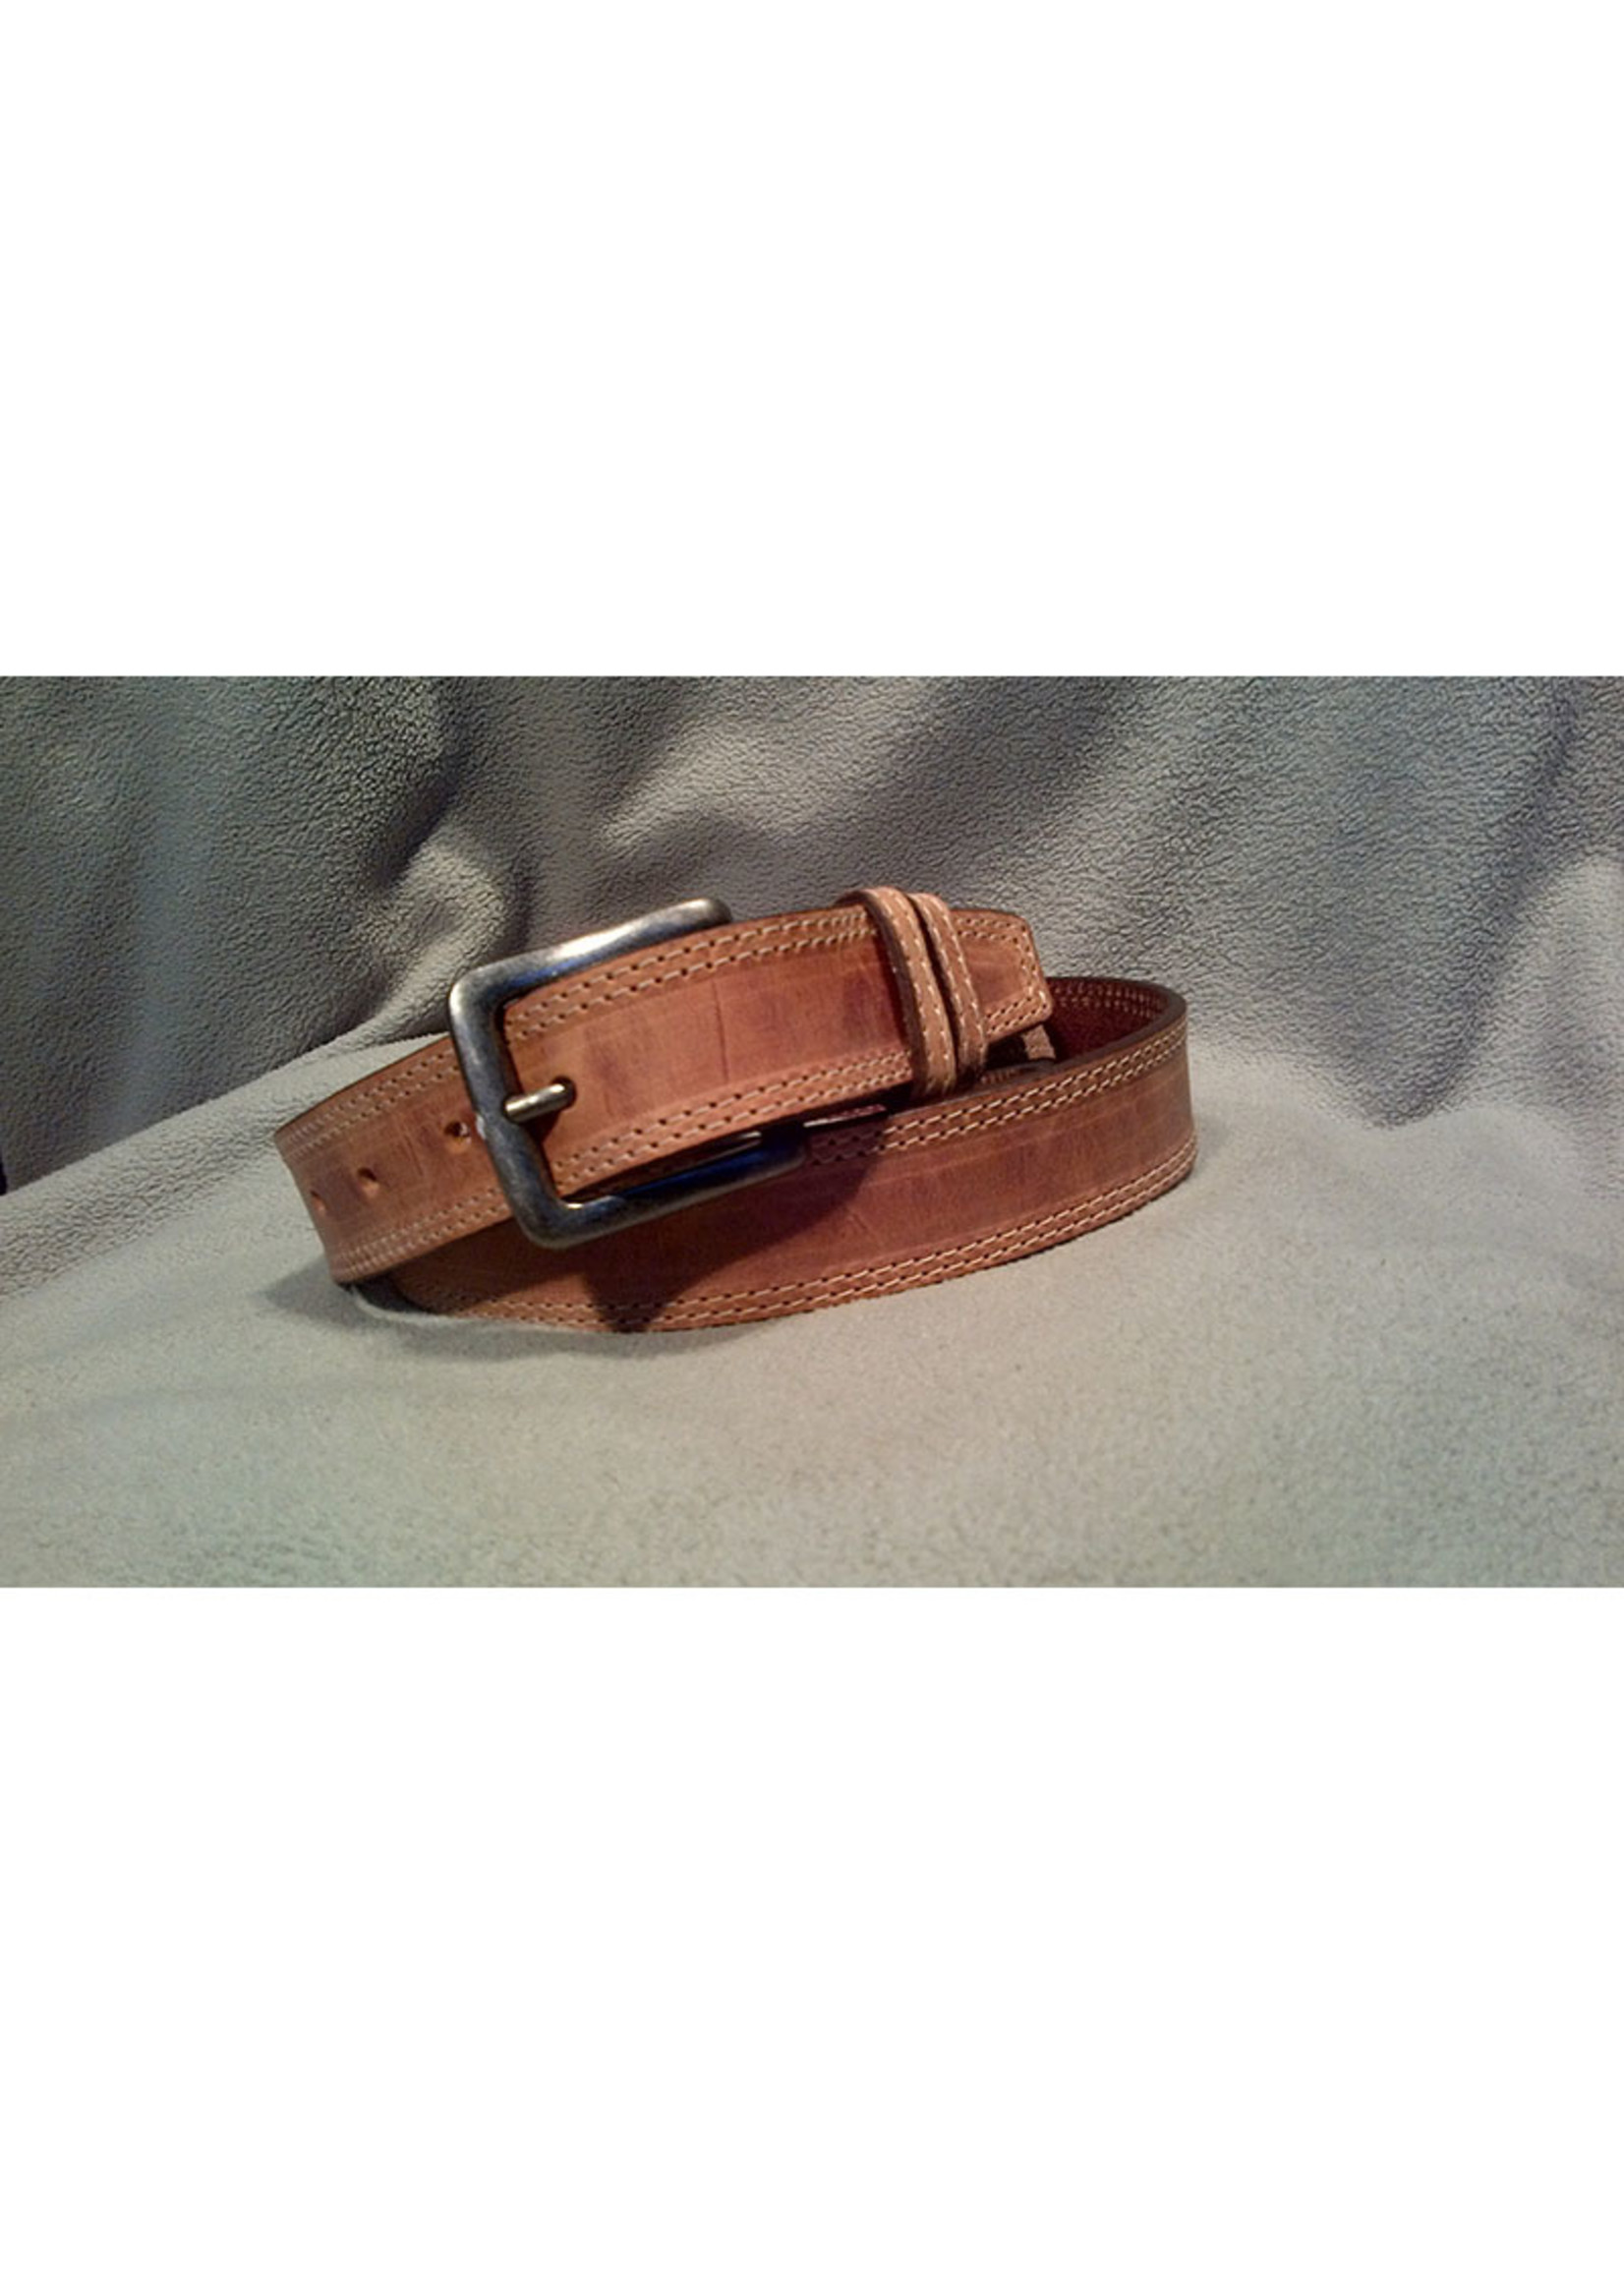 Europe Dezines Europa Dezines - Double Stitched Tan Leather Belt